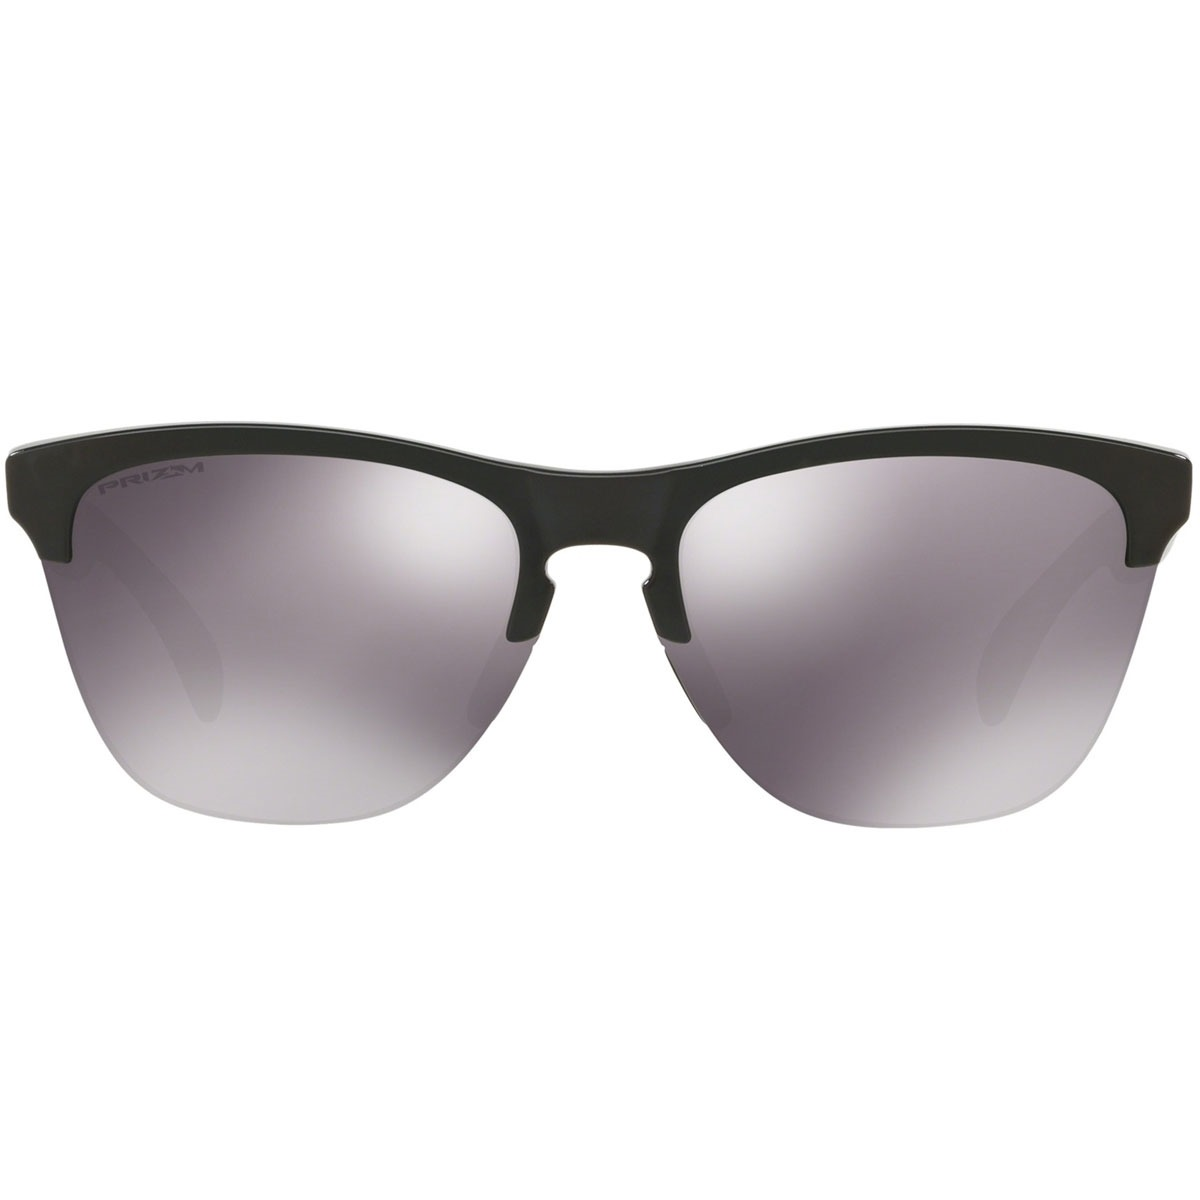 Óculos Oakley Frogskins Lite Polished Black   Prizm Black - R  510 ... b29db2e499